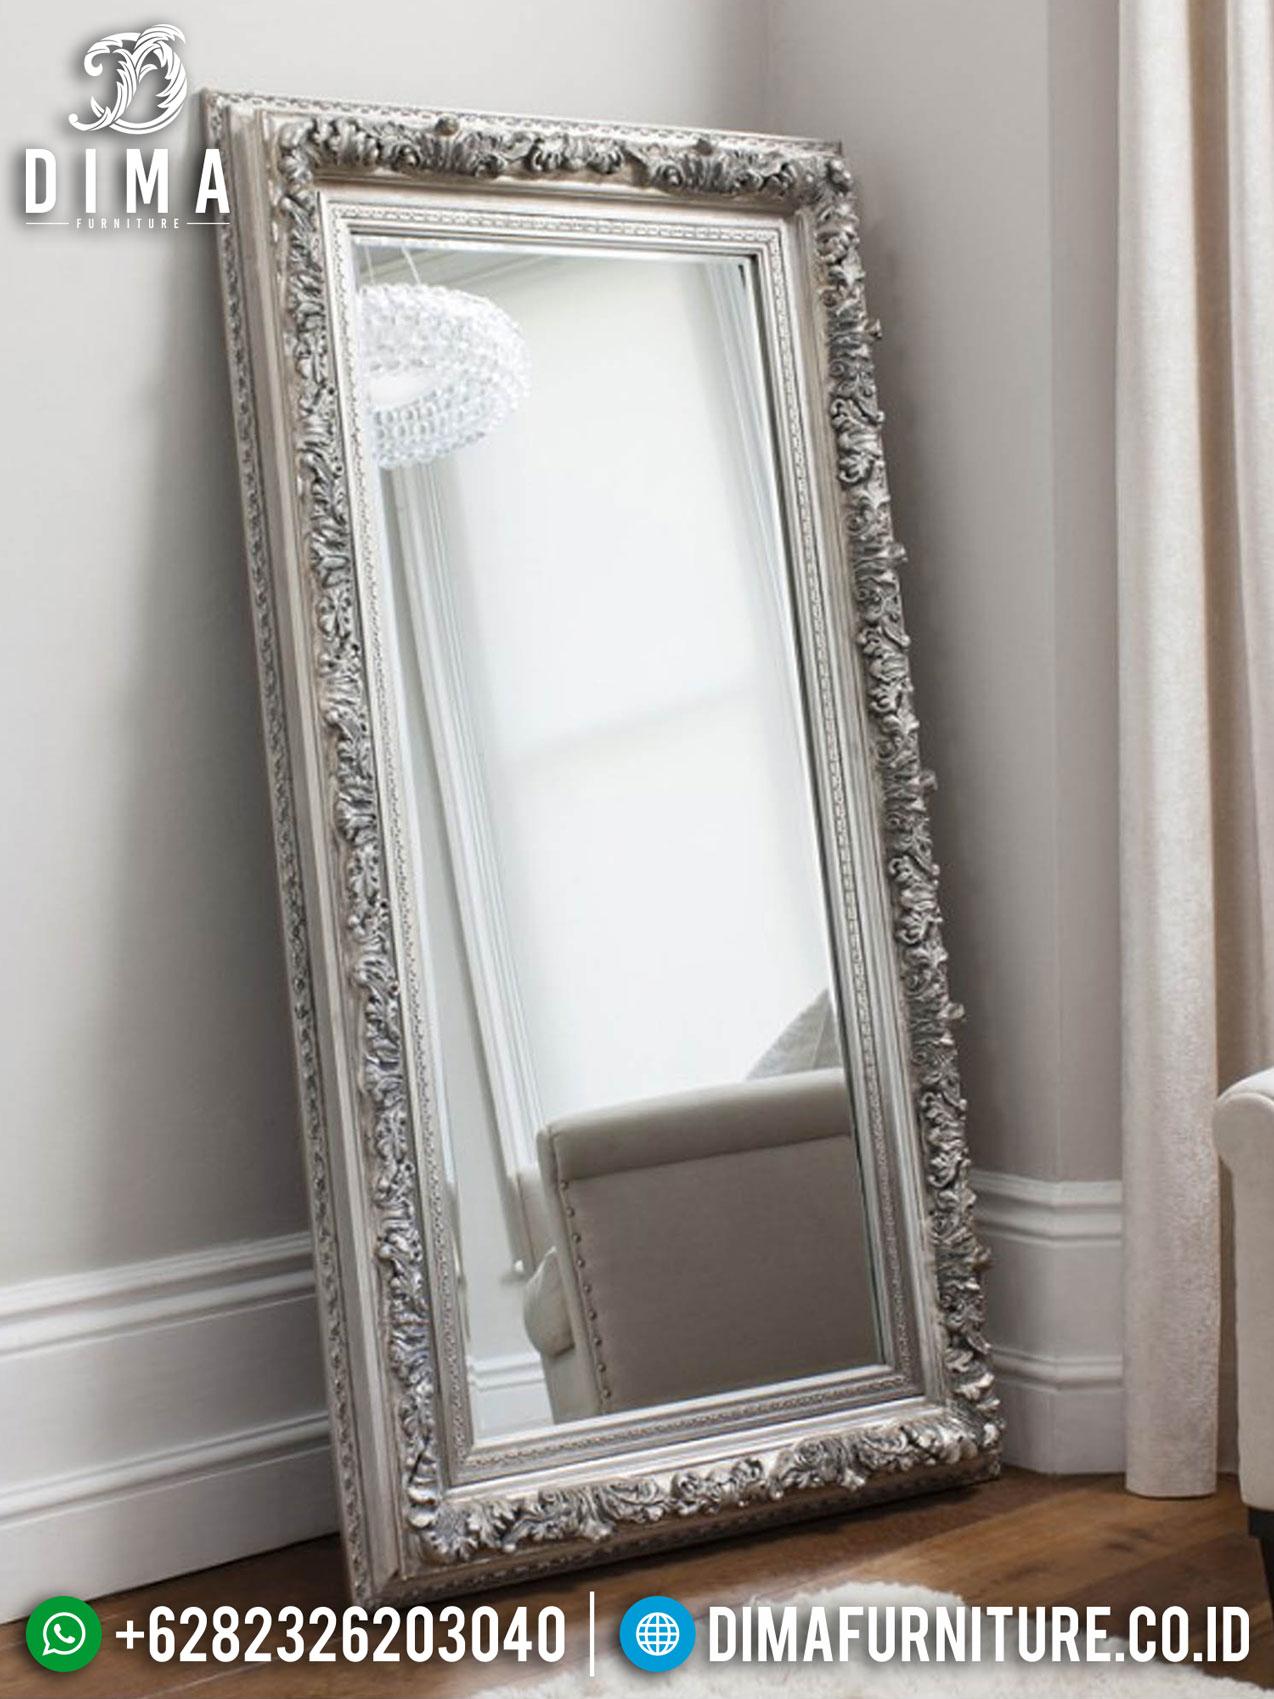 Cermin Rias Stand Mewah, Cermin Hias Luxury Best Quality Mahony Wood Perhutani TTJ-1293